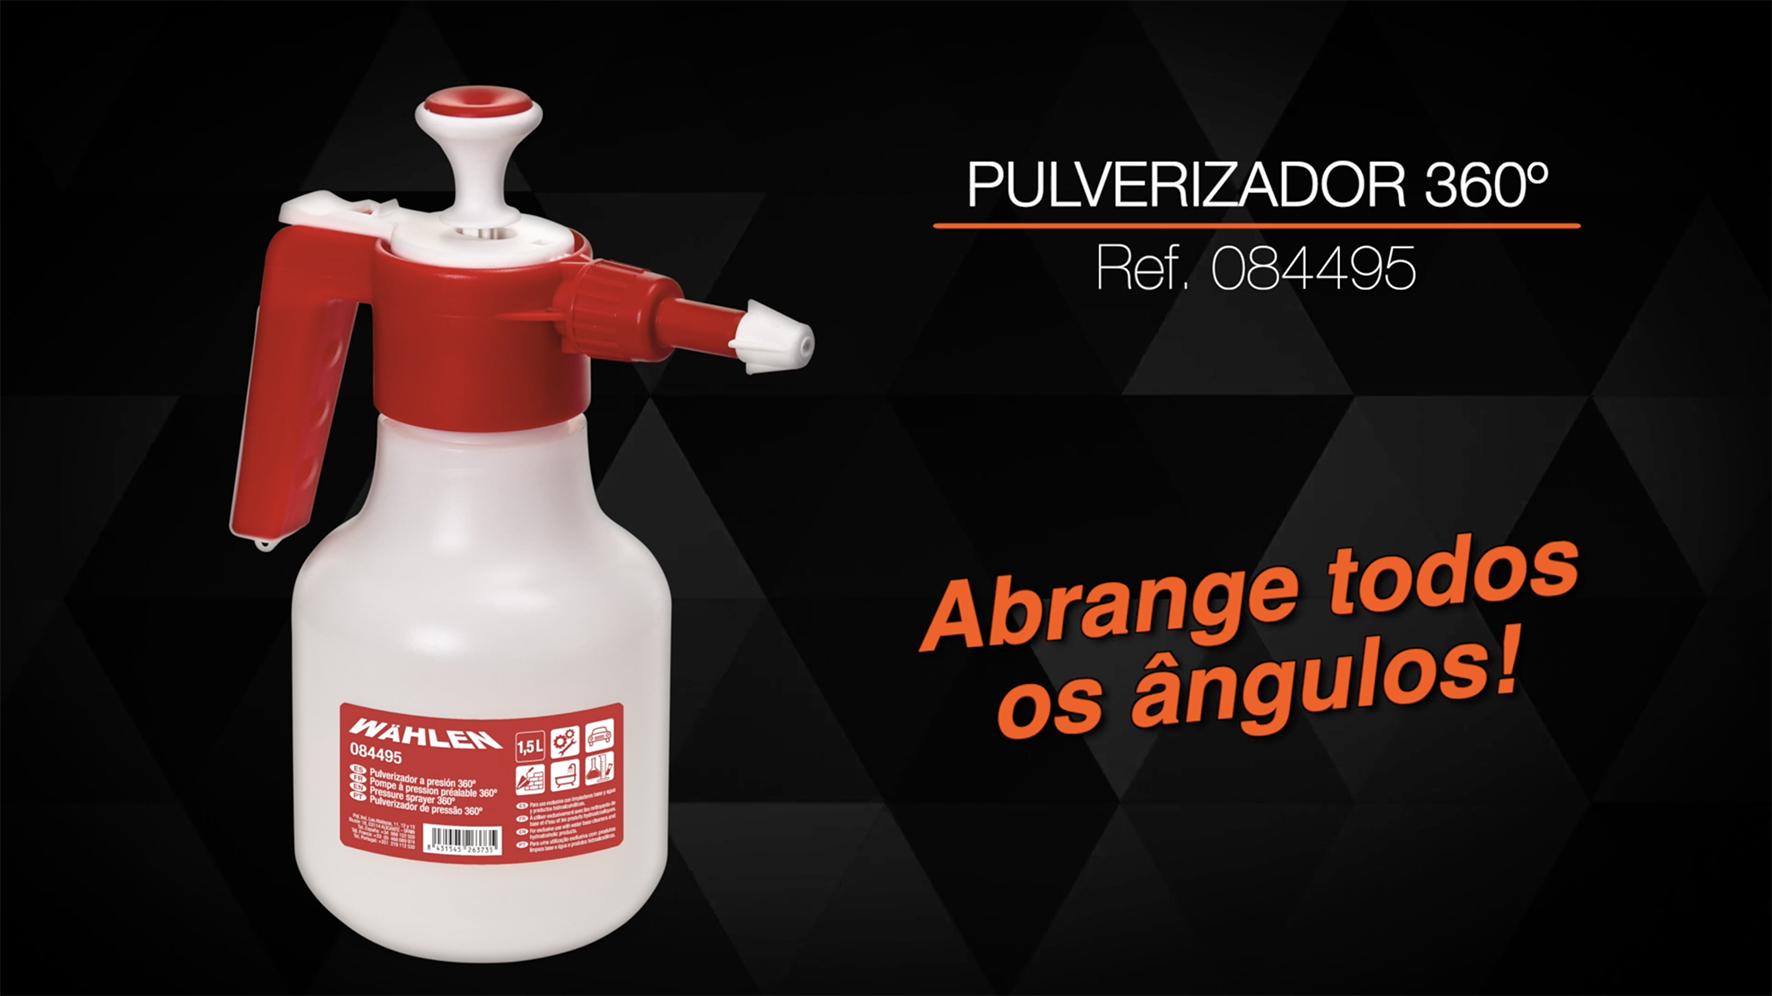 pulverizador-de-pressao-para-limpeza-de-superficies